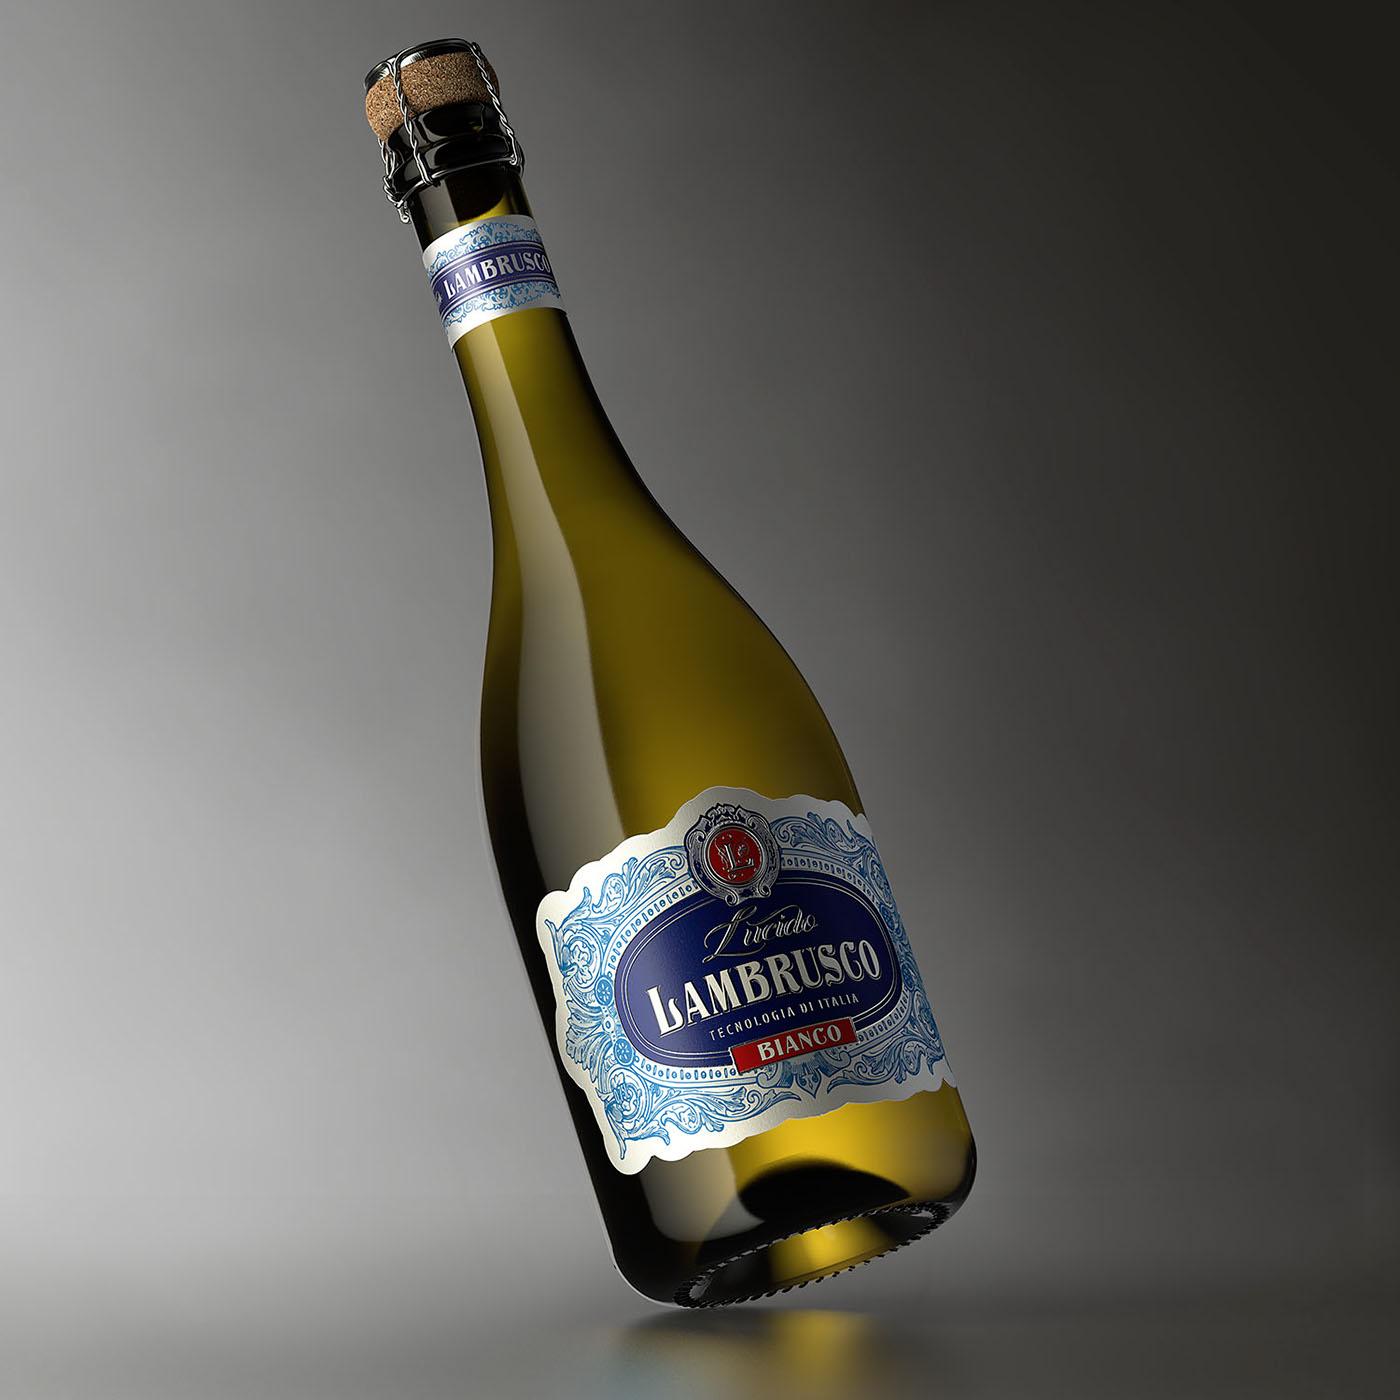 valerii shumilov shumilovedesign lambrusco packaging design Packaging label design Italy alcohol wine